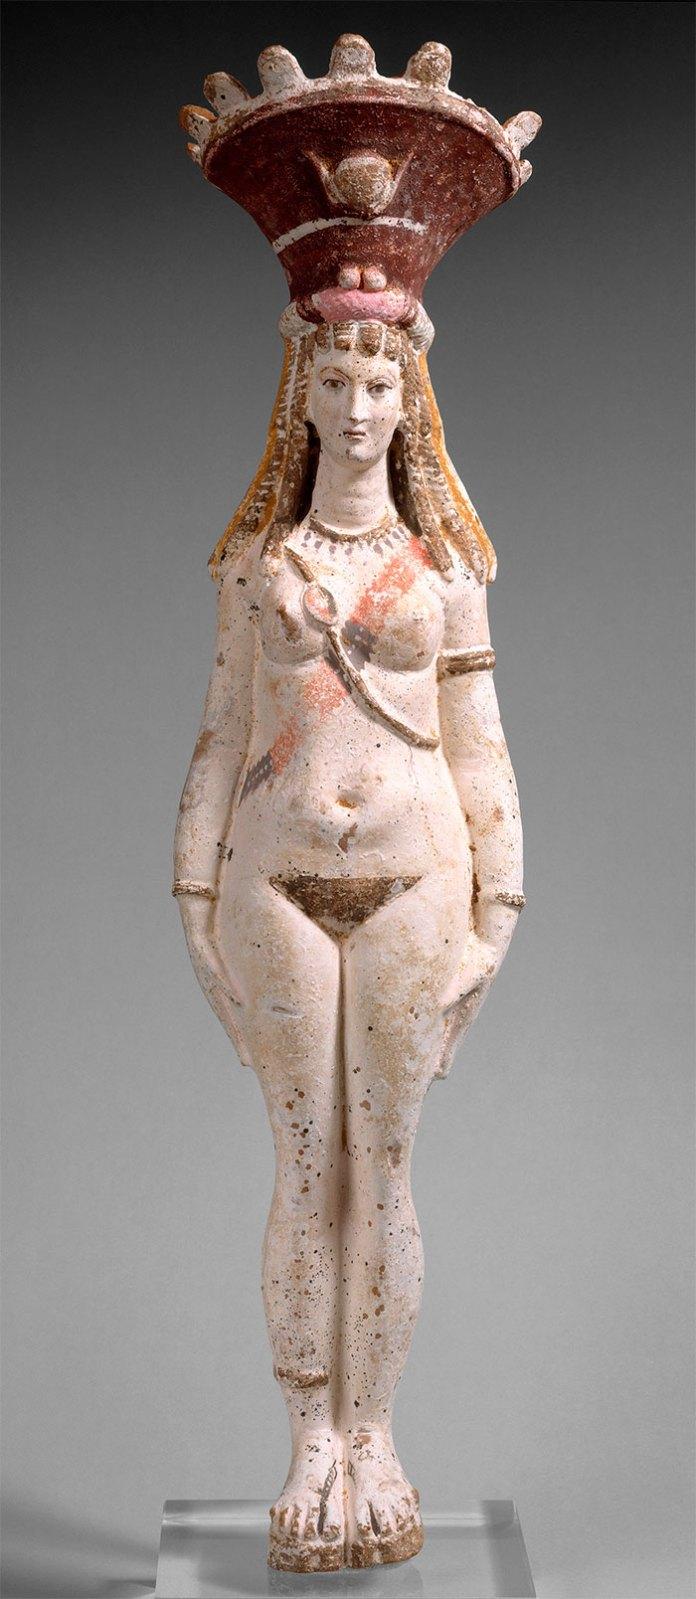 Богиня Ізіс/Афродіта. Єгипет, 3ст. Музей Метрополітен (Нью-Йорк)